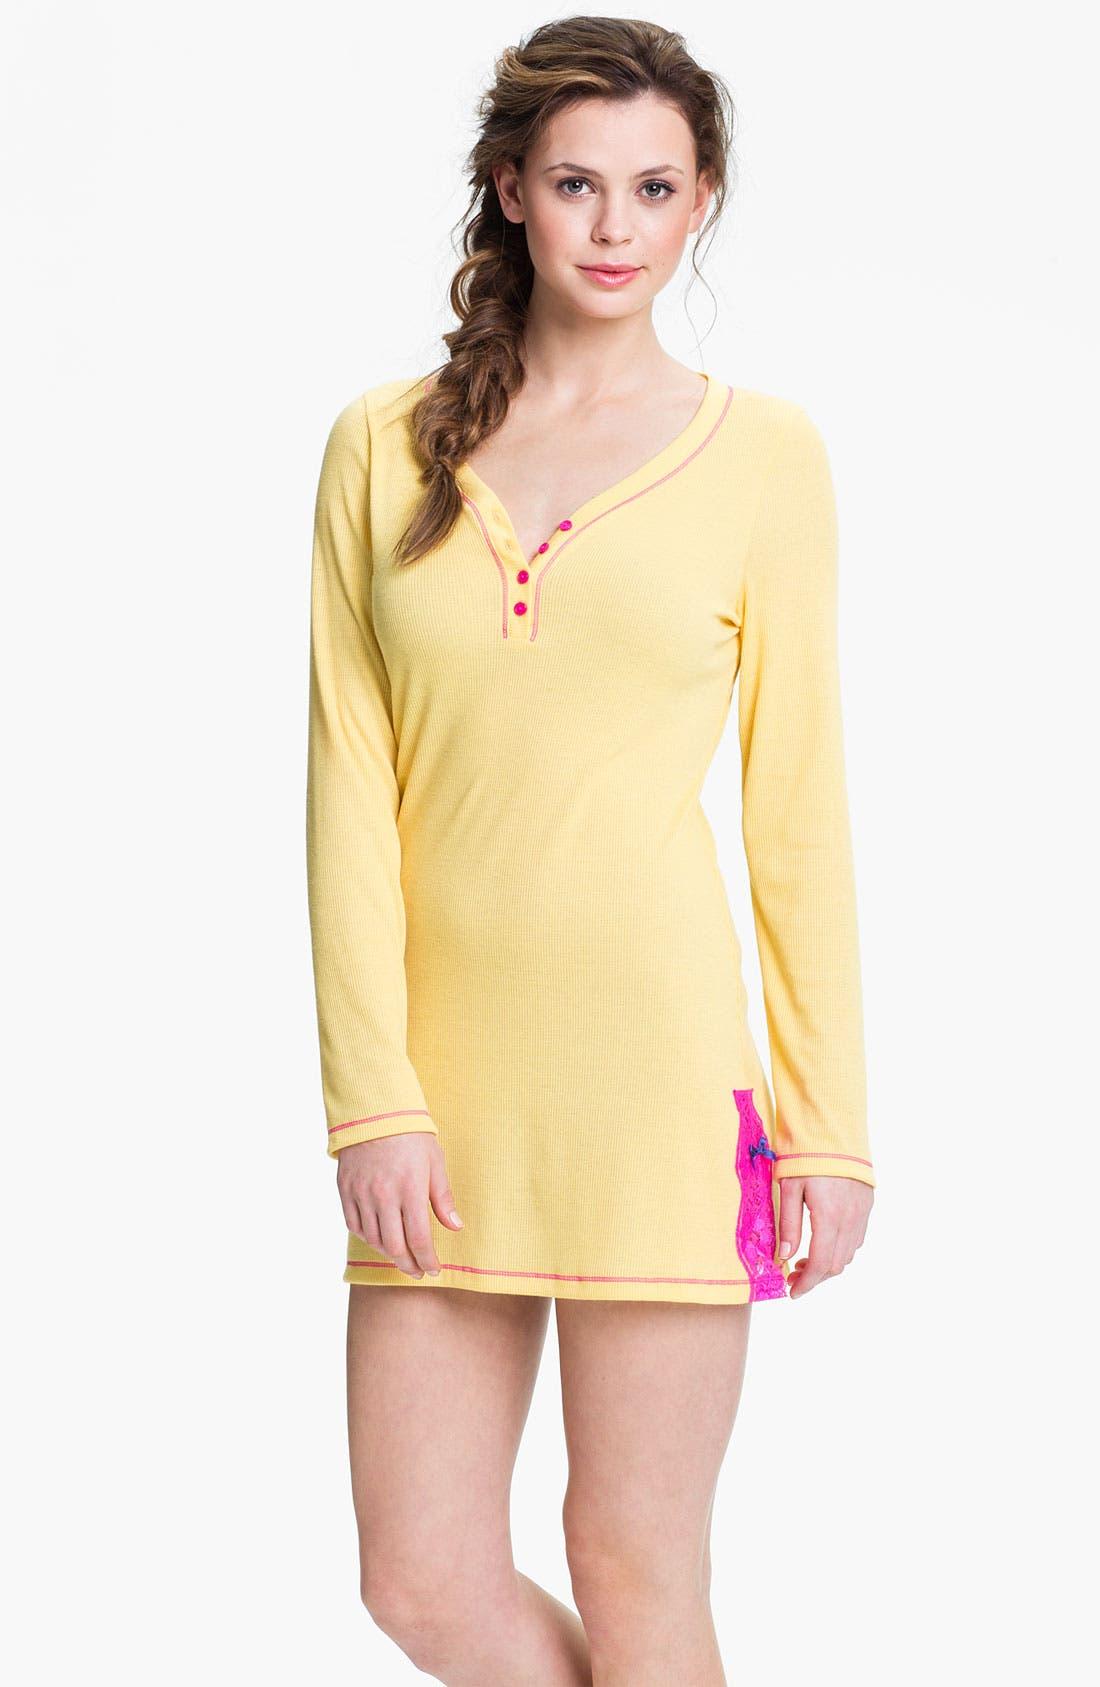 Alternate Image 1 Selected - Honeydew Intimates 'Love Me Tender' Lace Detail Sleep Shirt